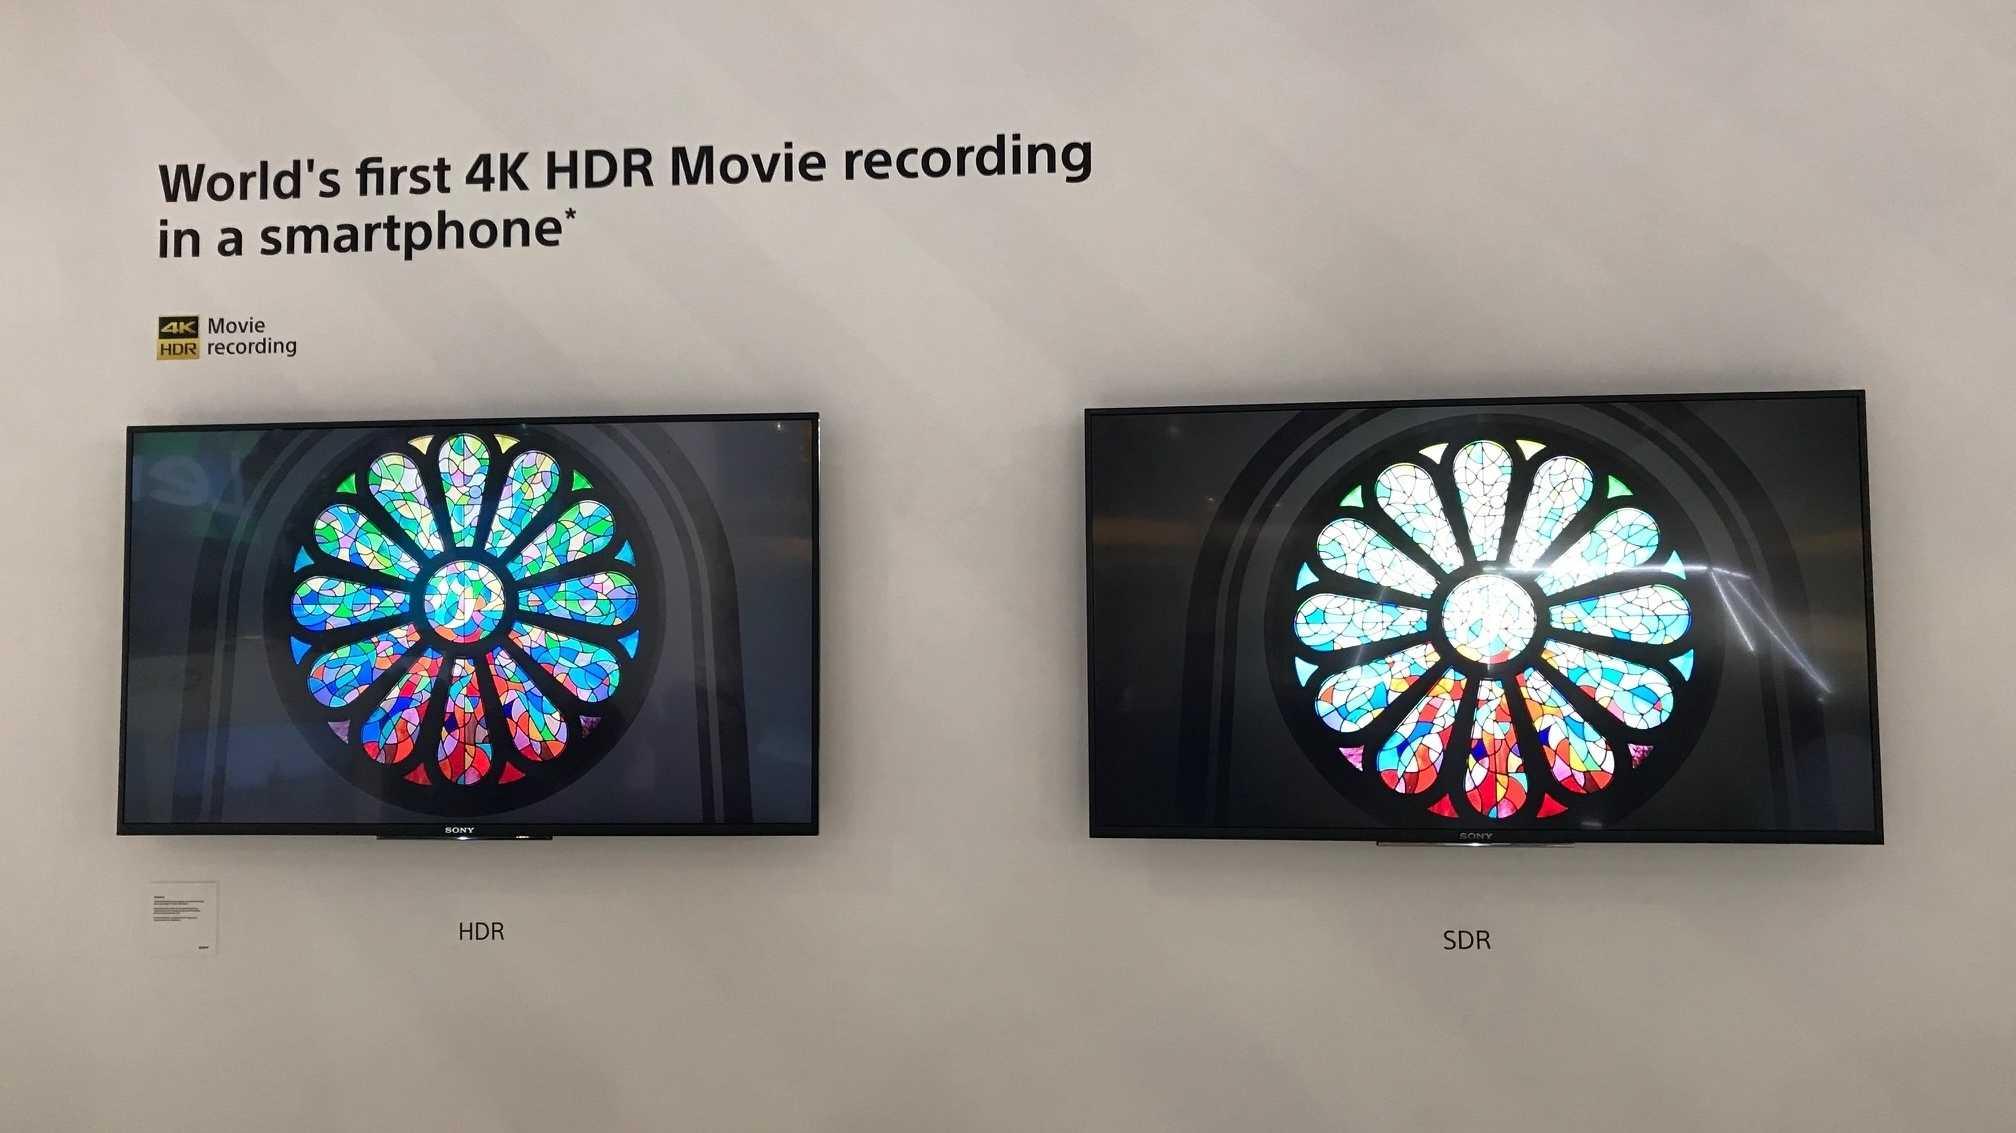 Xperia XZ2: So nimmt Sonys Highend-Smartphone in HDR auf